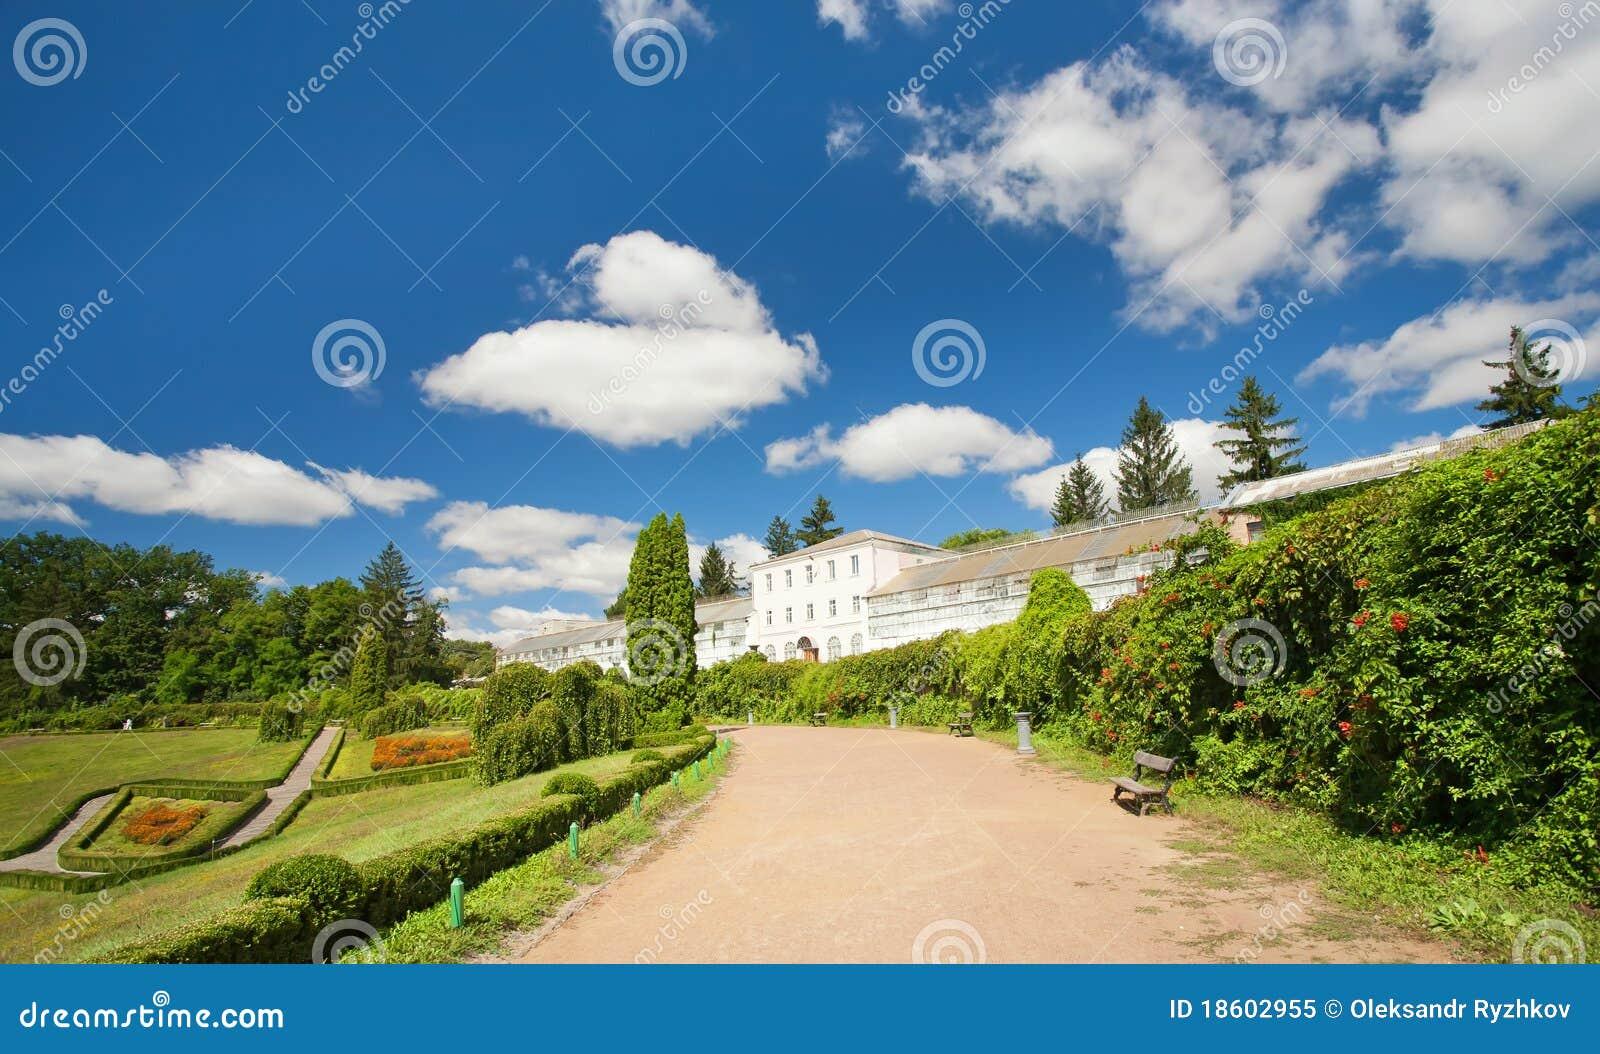 fotos de jardim grande:Foto de Stock Royalty Free: Jardim e a casa grande